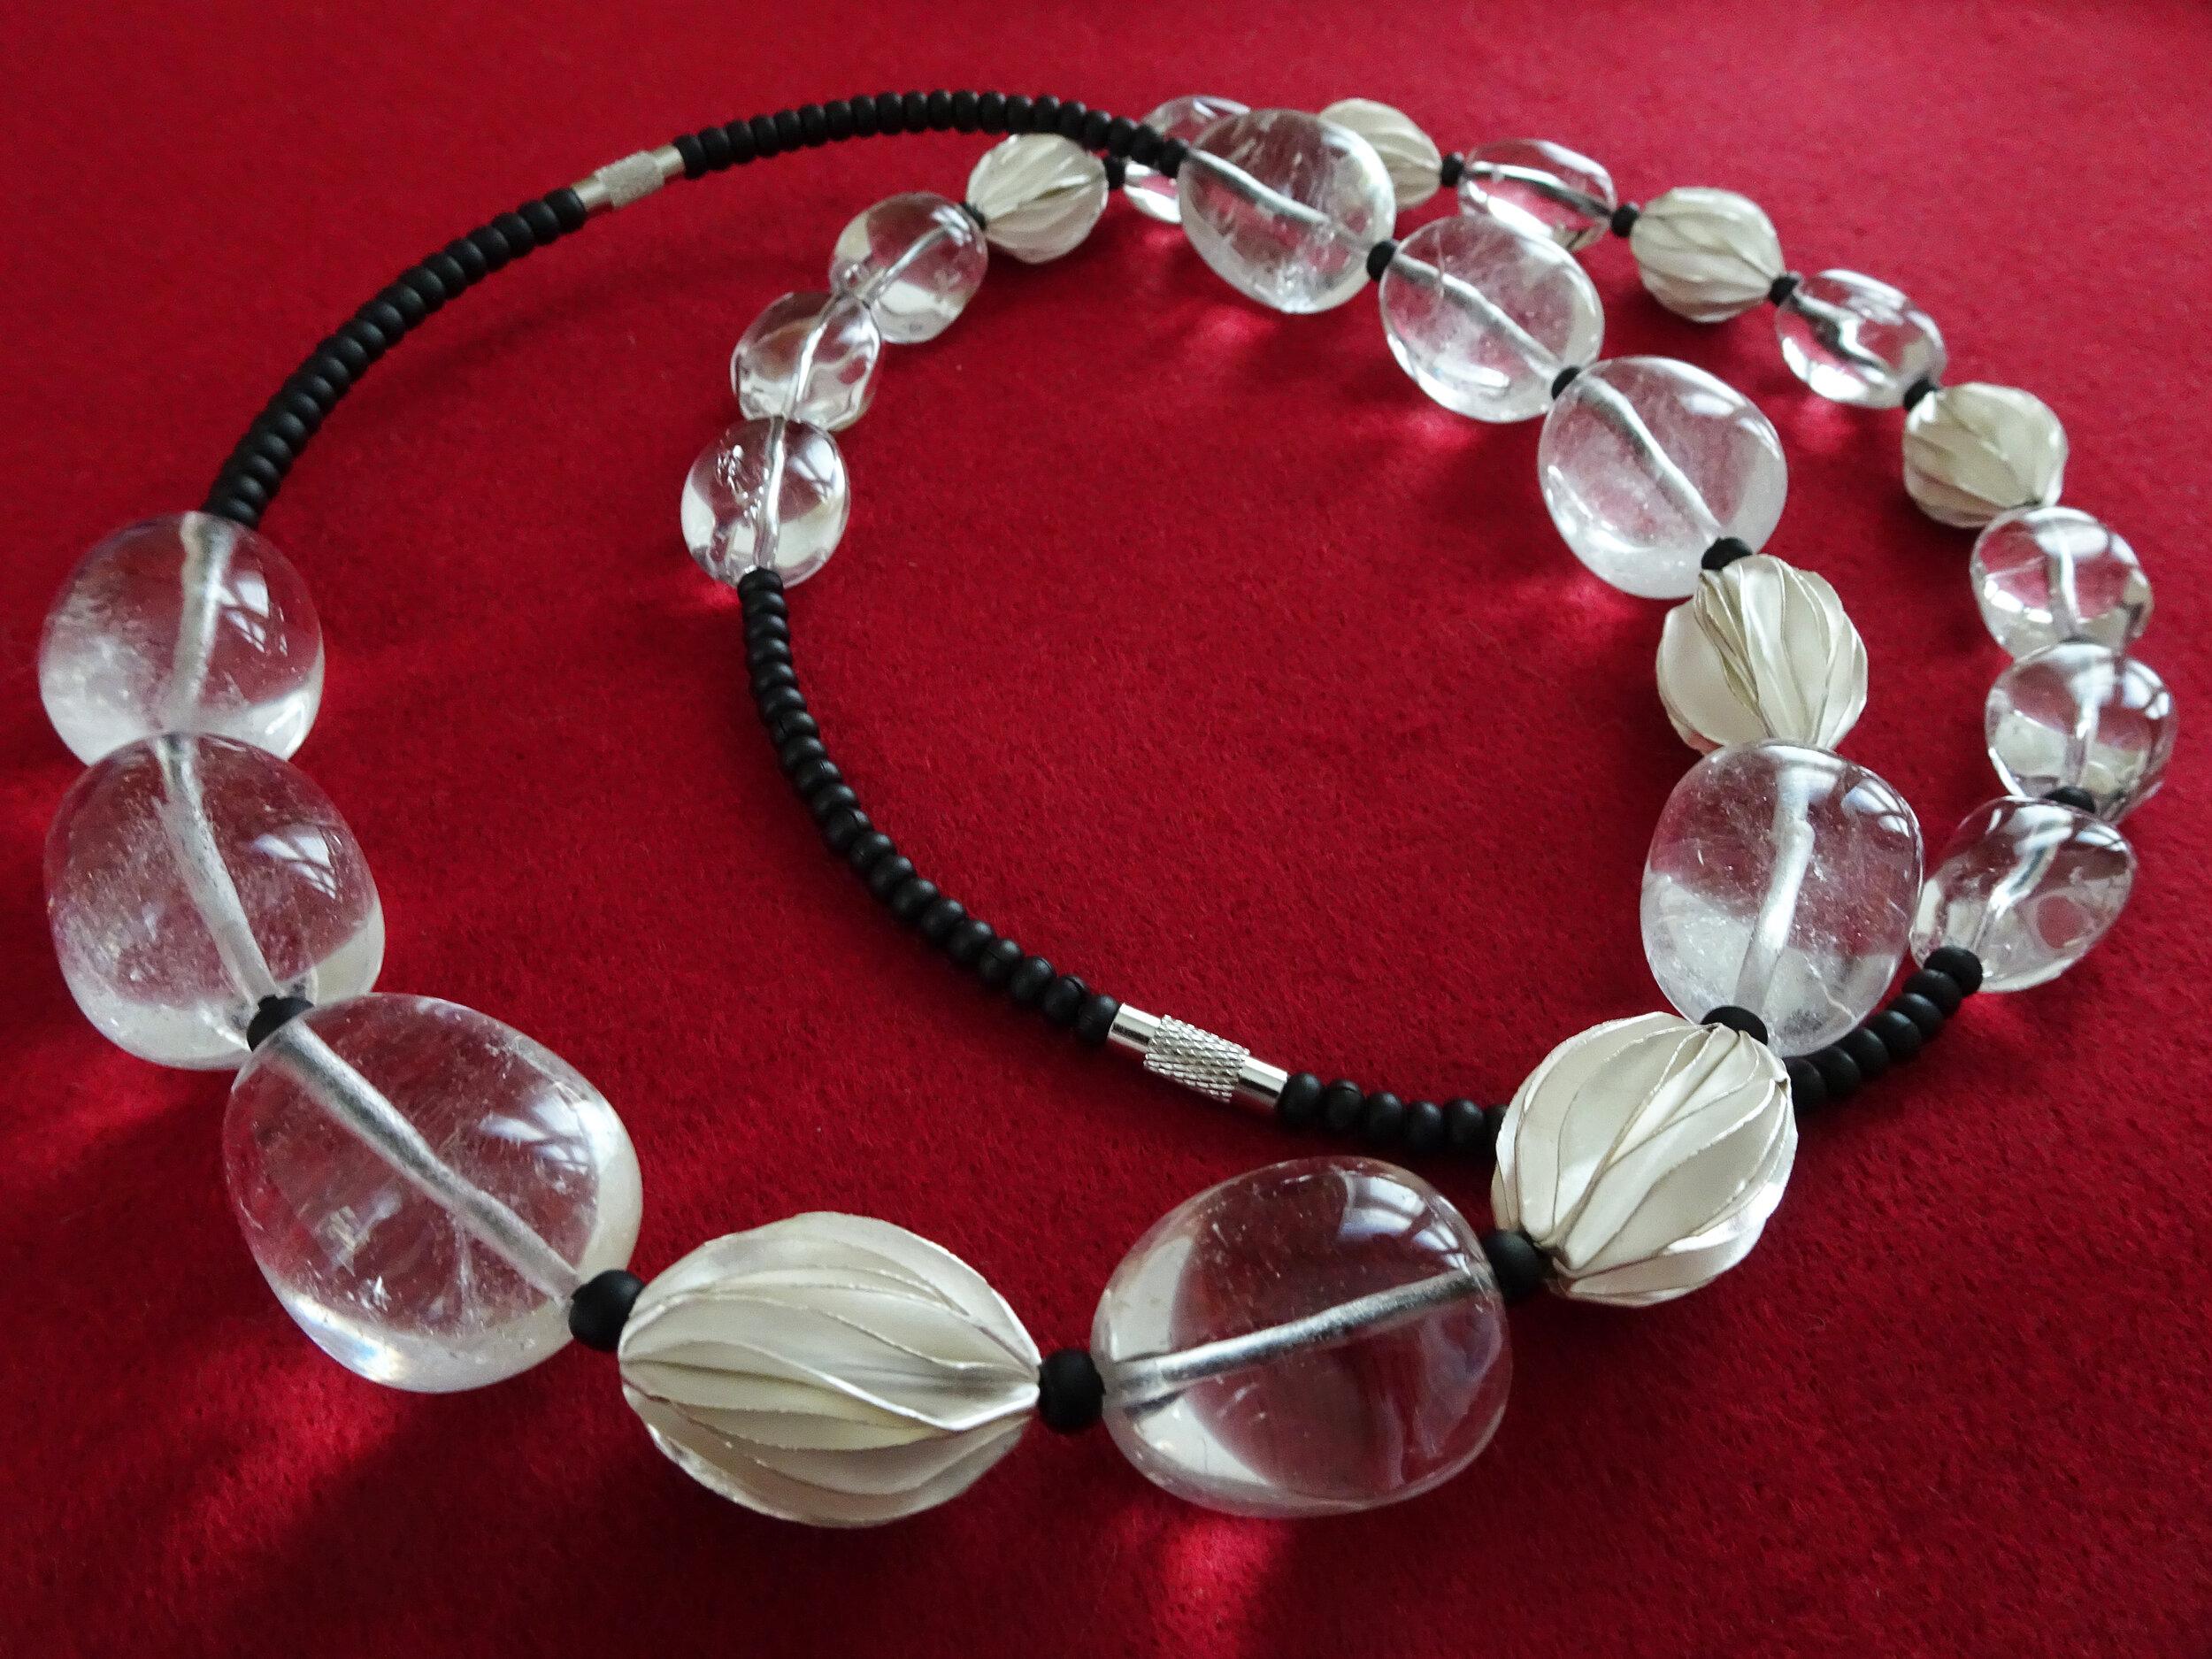 Pale in Comparison 2019  Necklace  Quartz, Glass, Sterling Silver